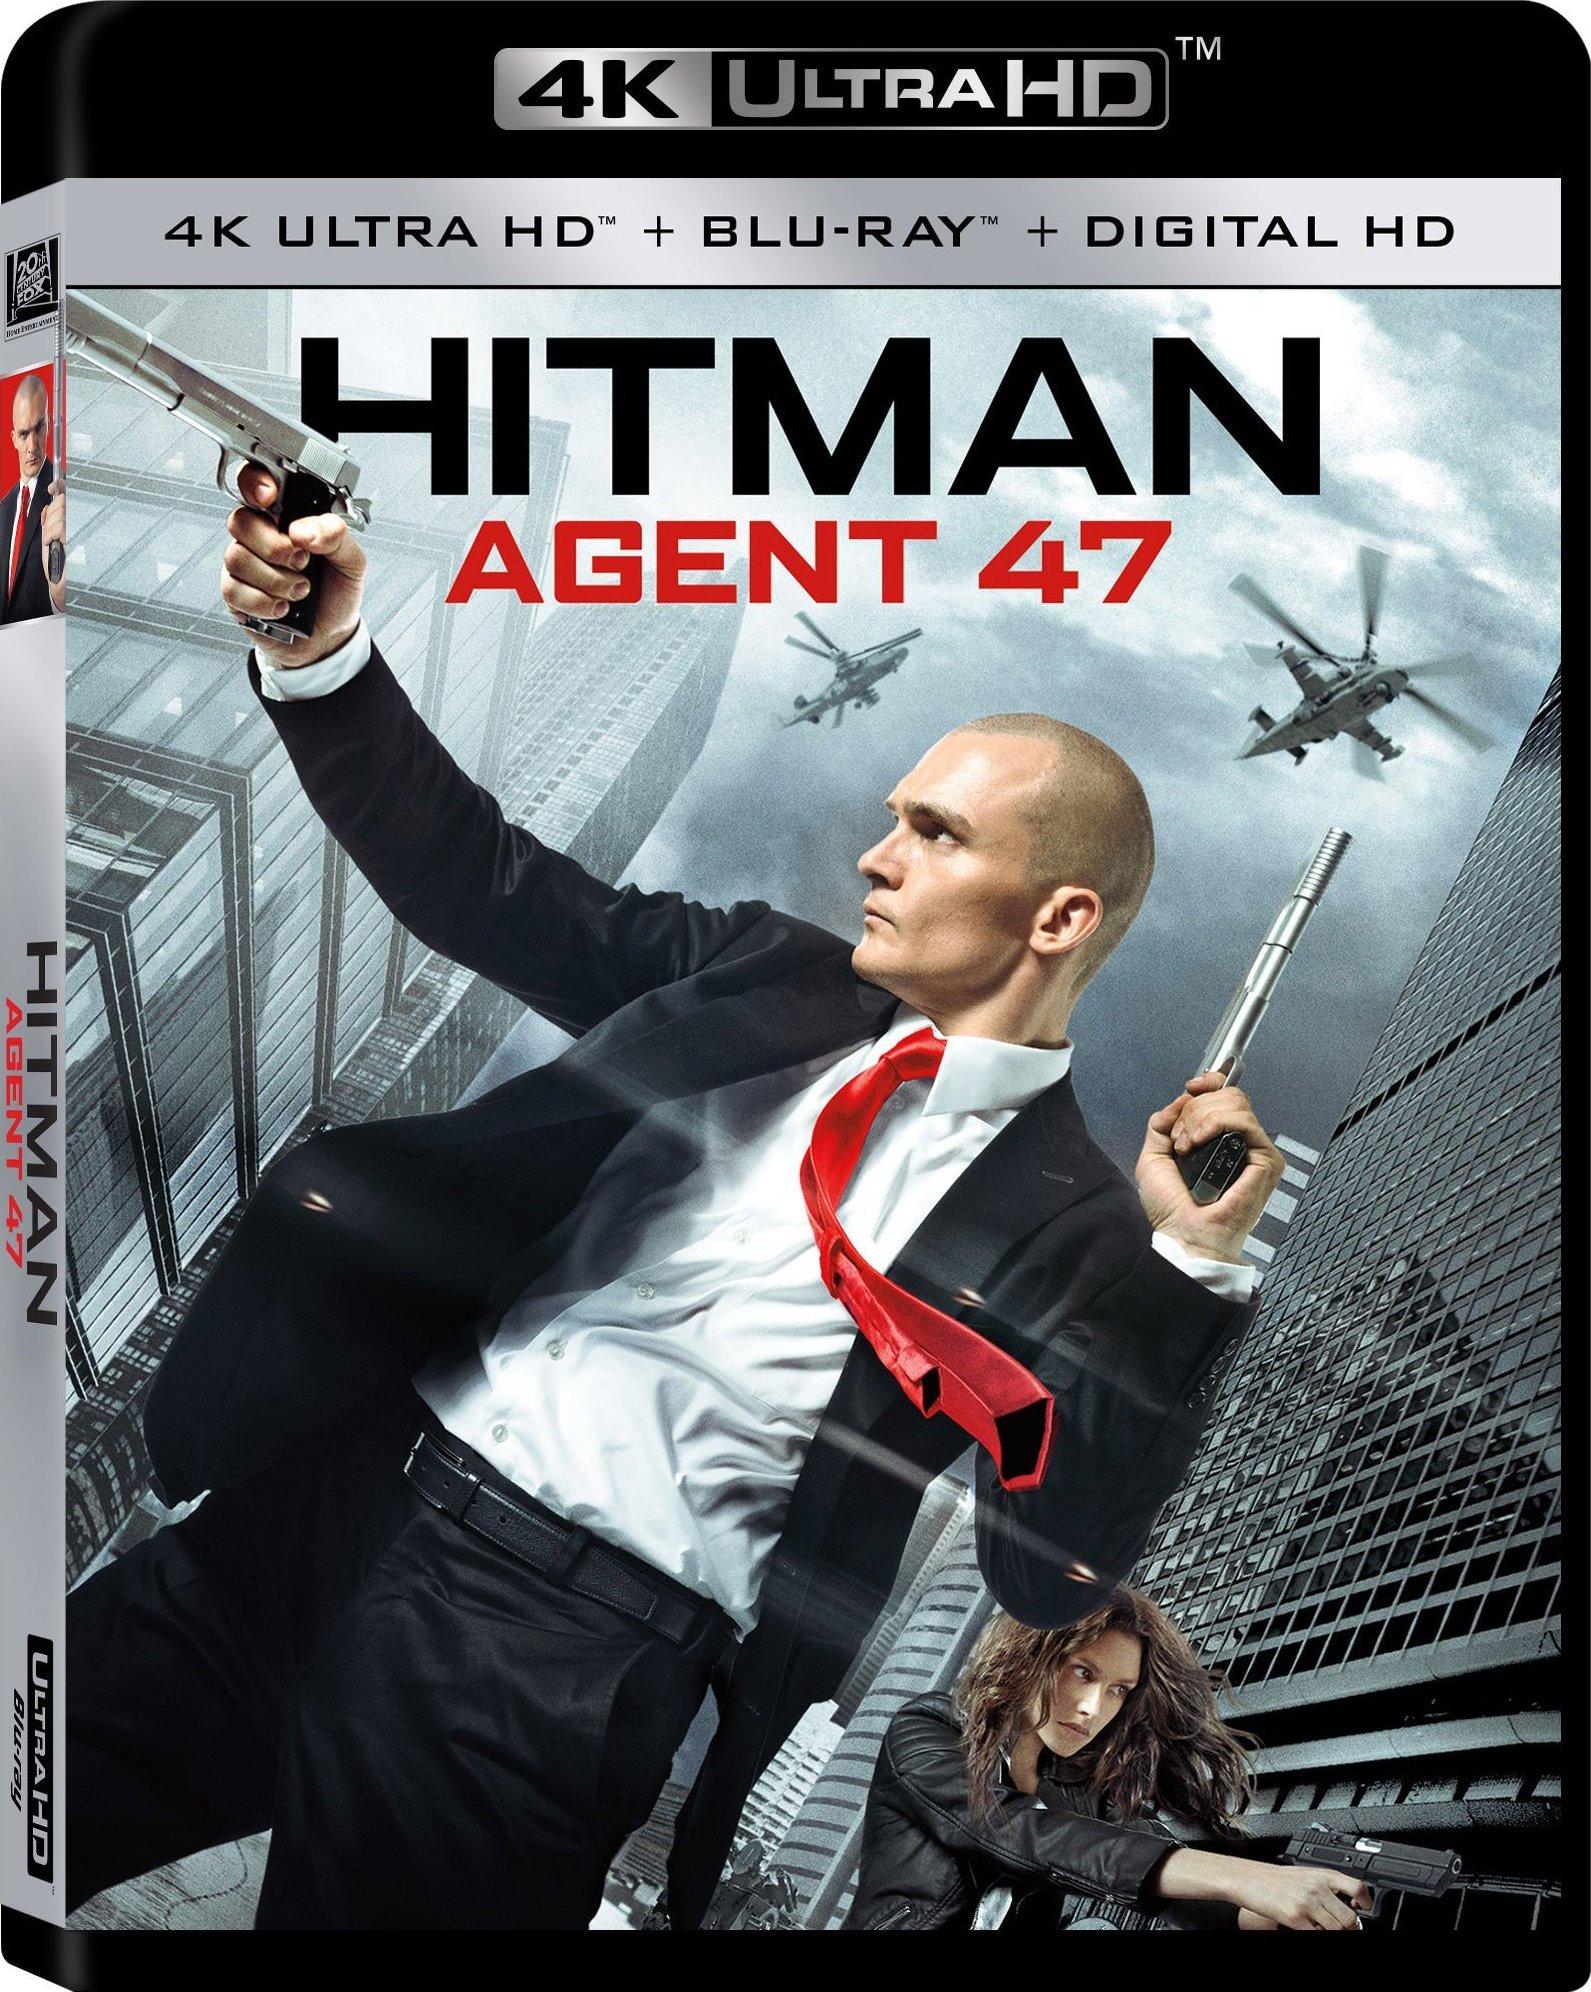 Hitman: Agent 47 (2015) 4K Ultra HD Blu-ray